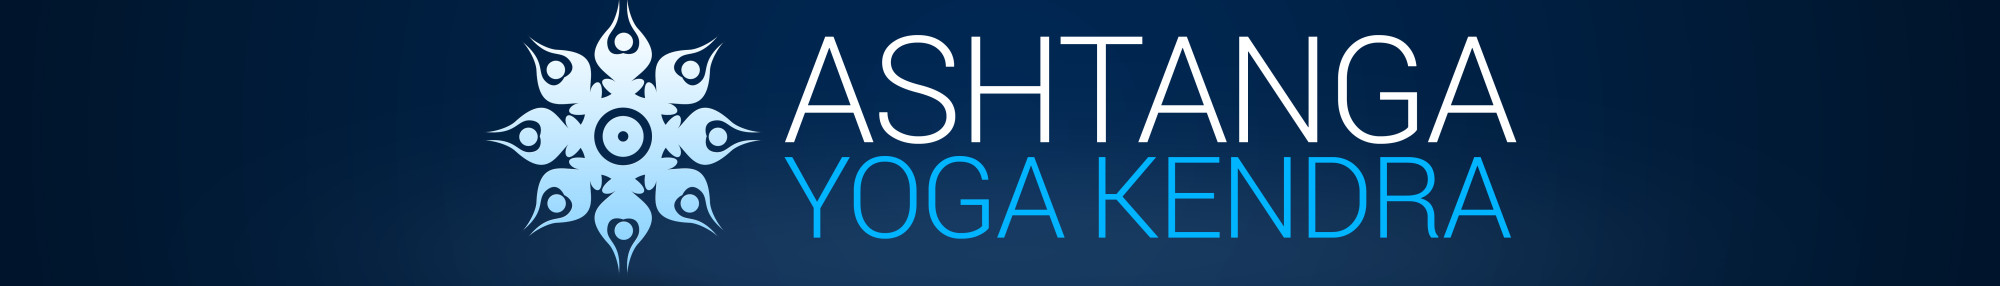 cropped-Ashtanga-Yoga-Kendra-Hording.jpg